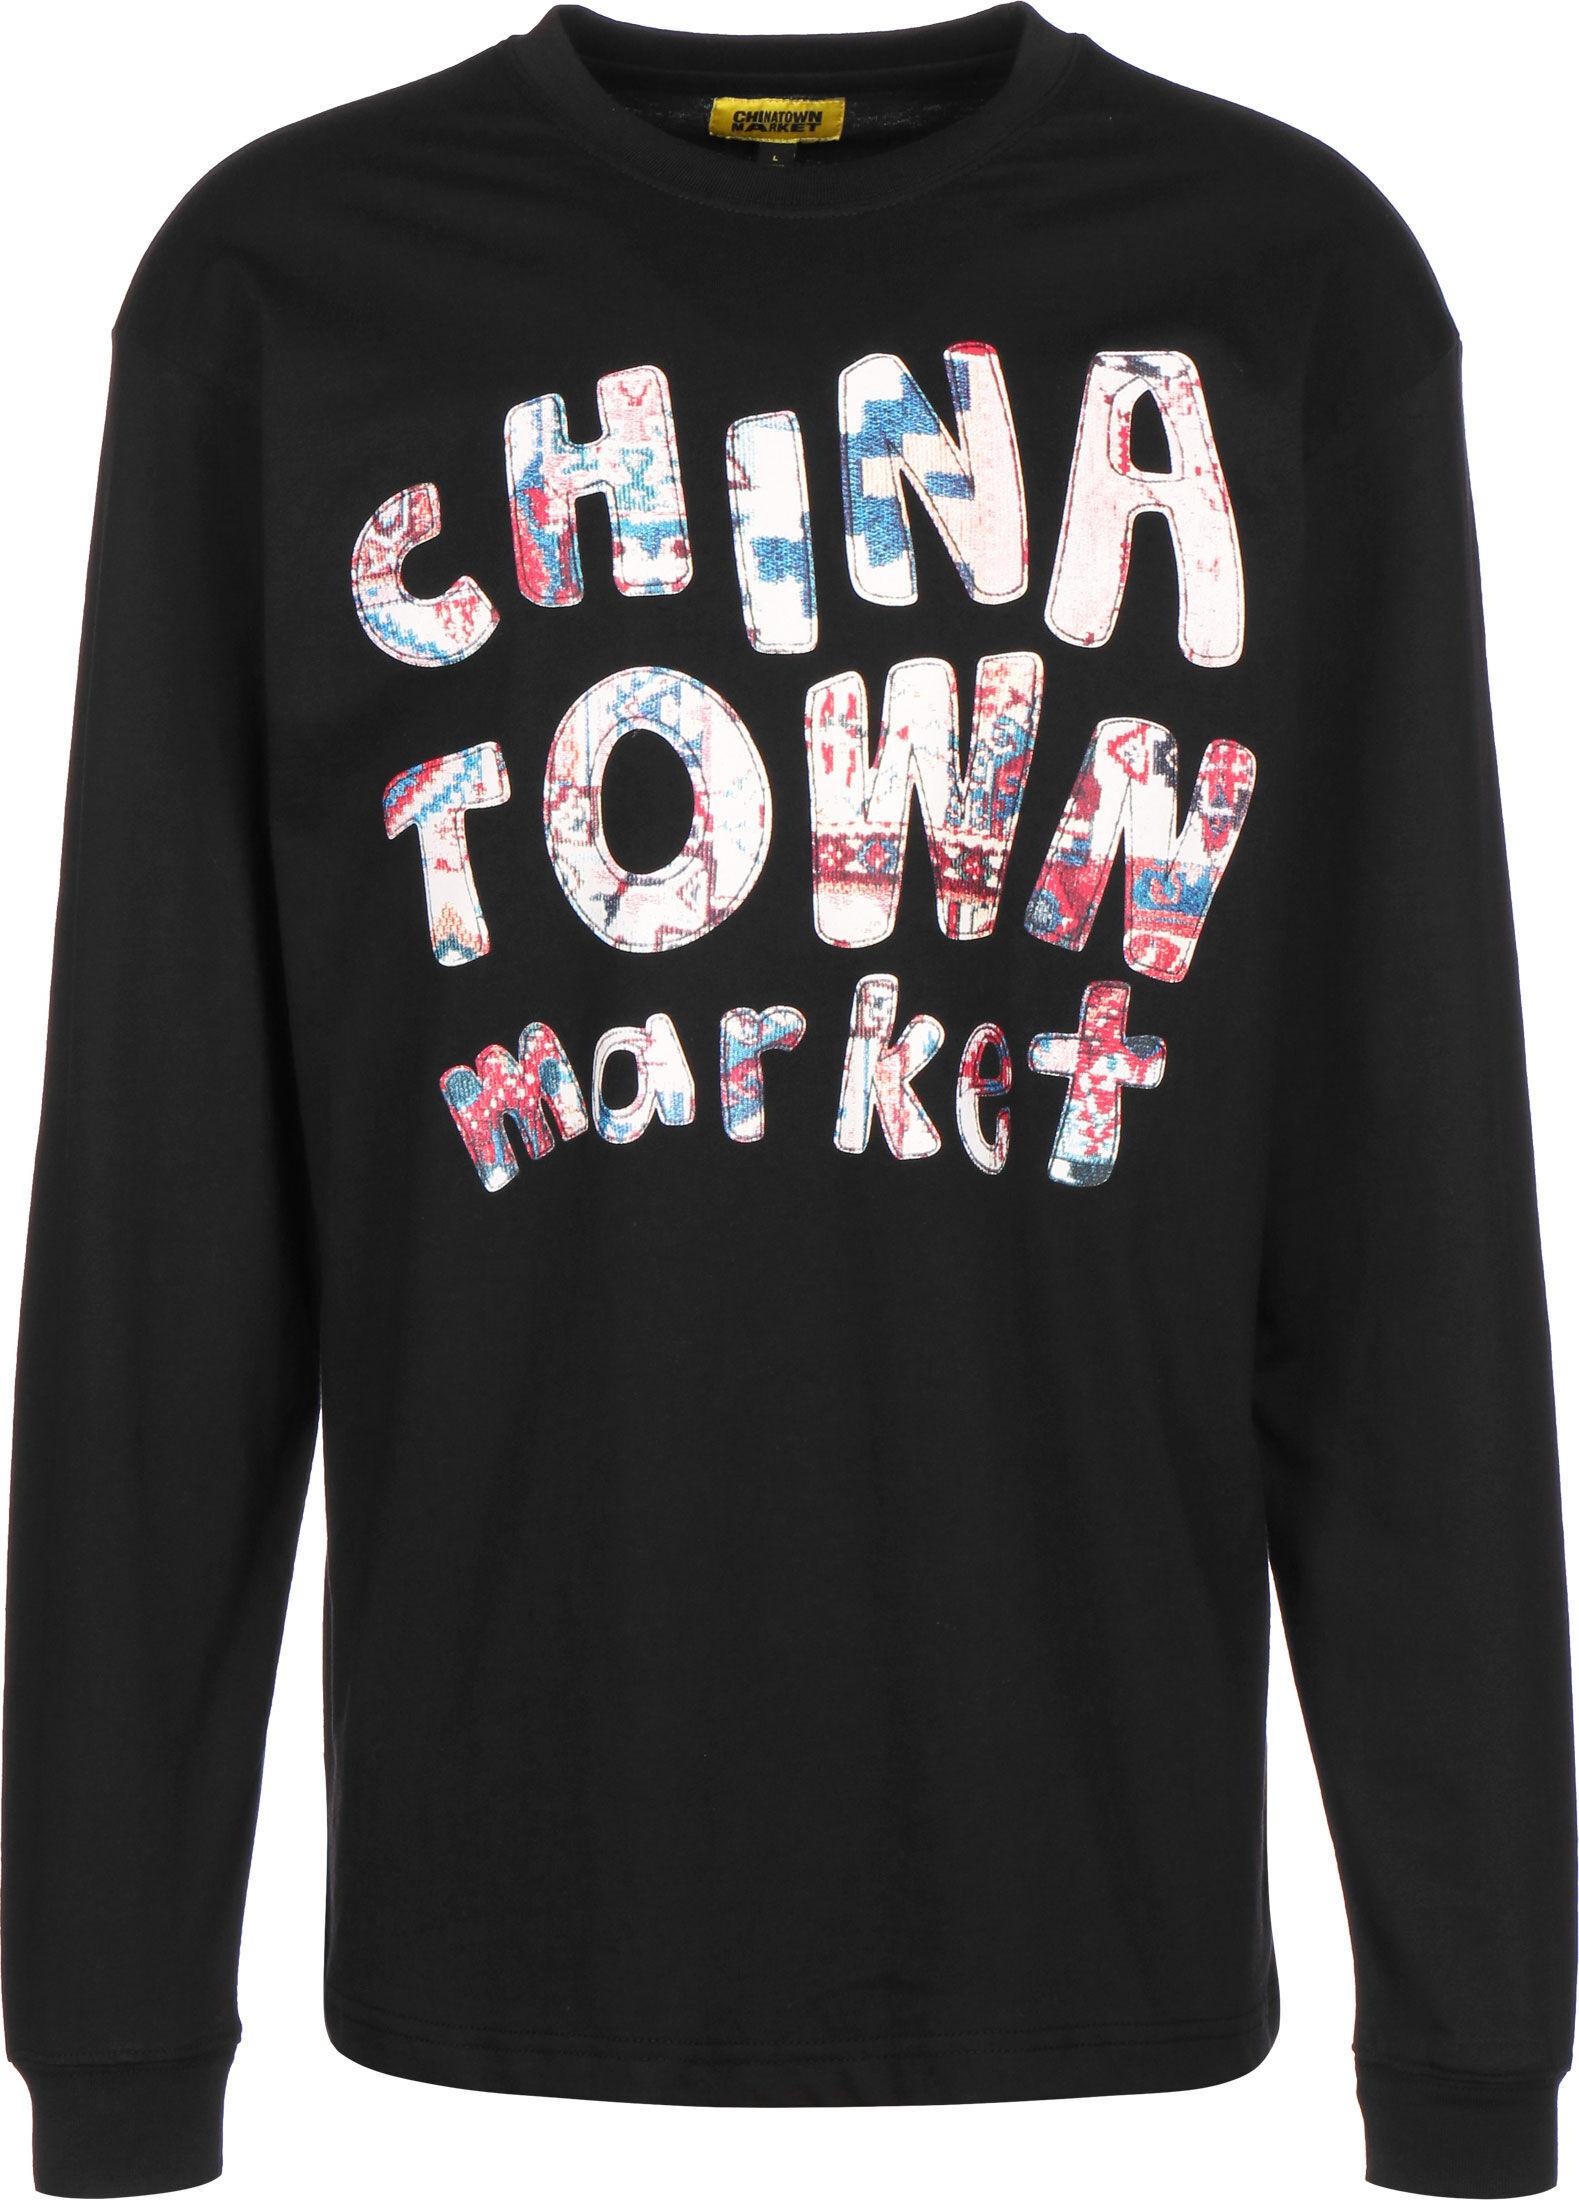 Chinatown Market Rug Dealer, taille M, homme, noir